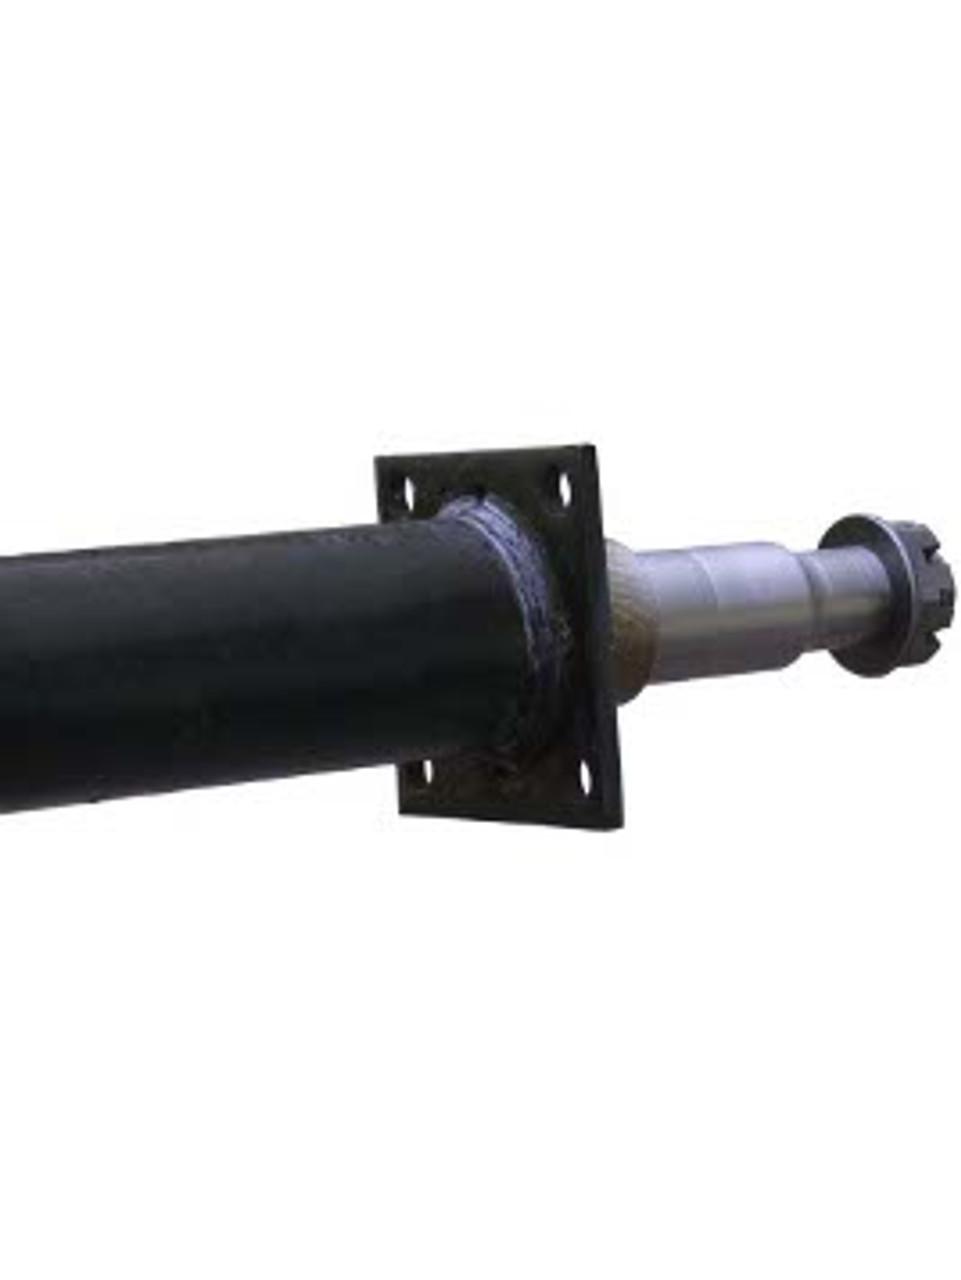 "RT3595-84FS --- 2-3/8"" Round Dexter Straight Axles  - 3,500 lb Capacity - 95"" Hub Face"